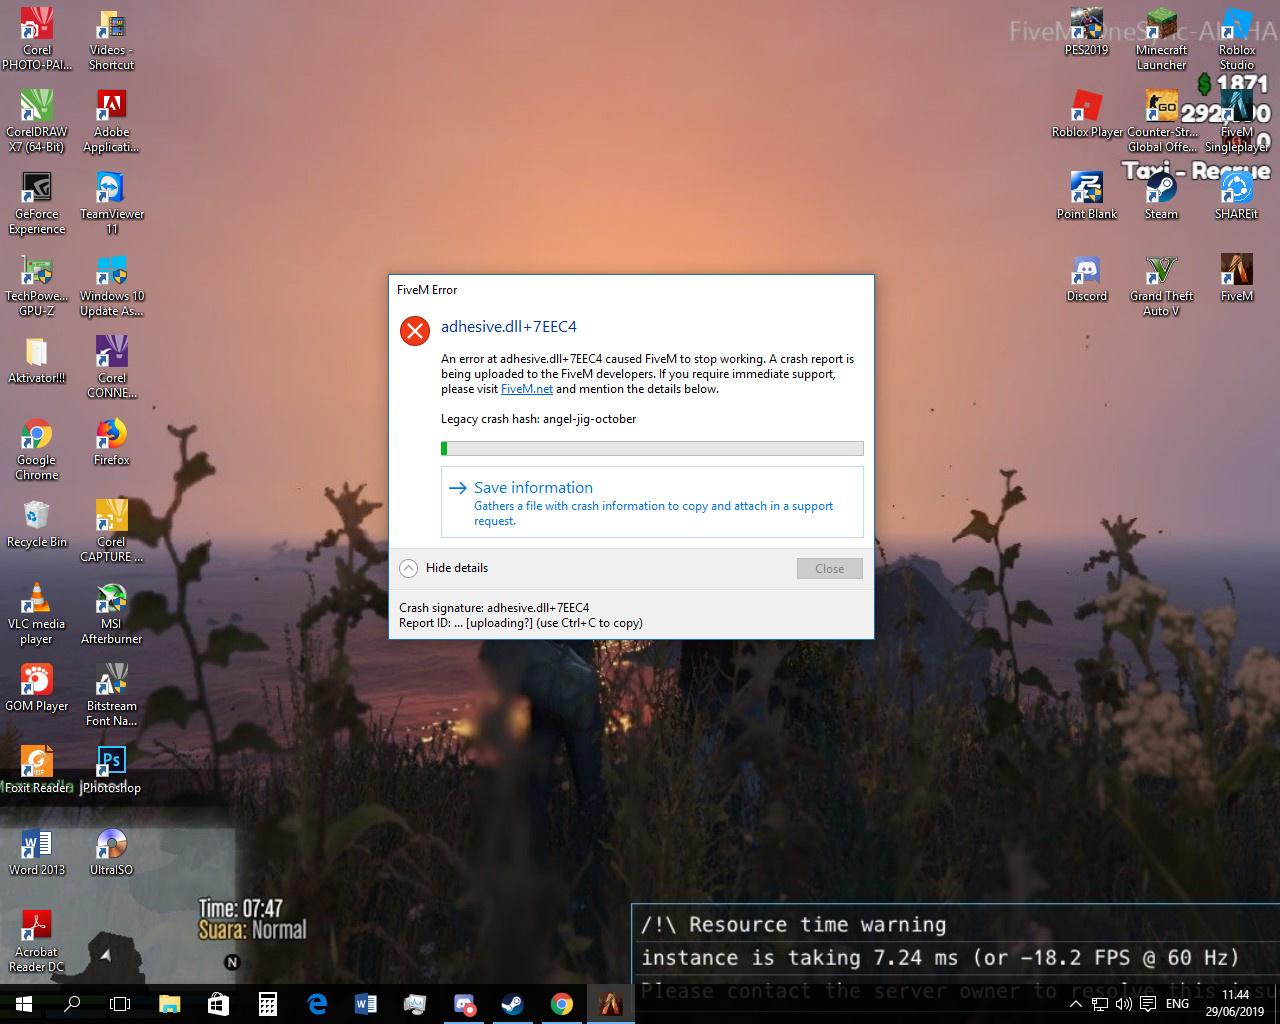 FiveM has encountered an error OpenIV - Technical Support